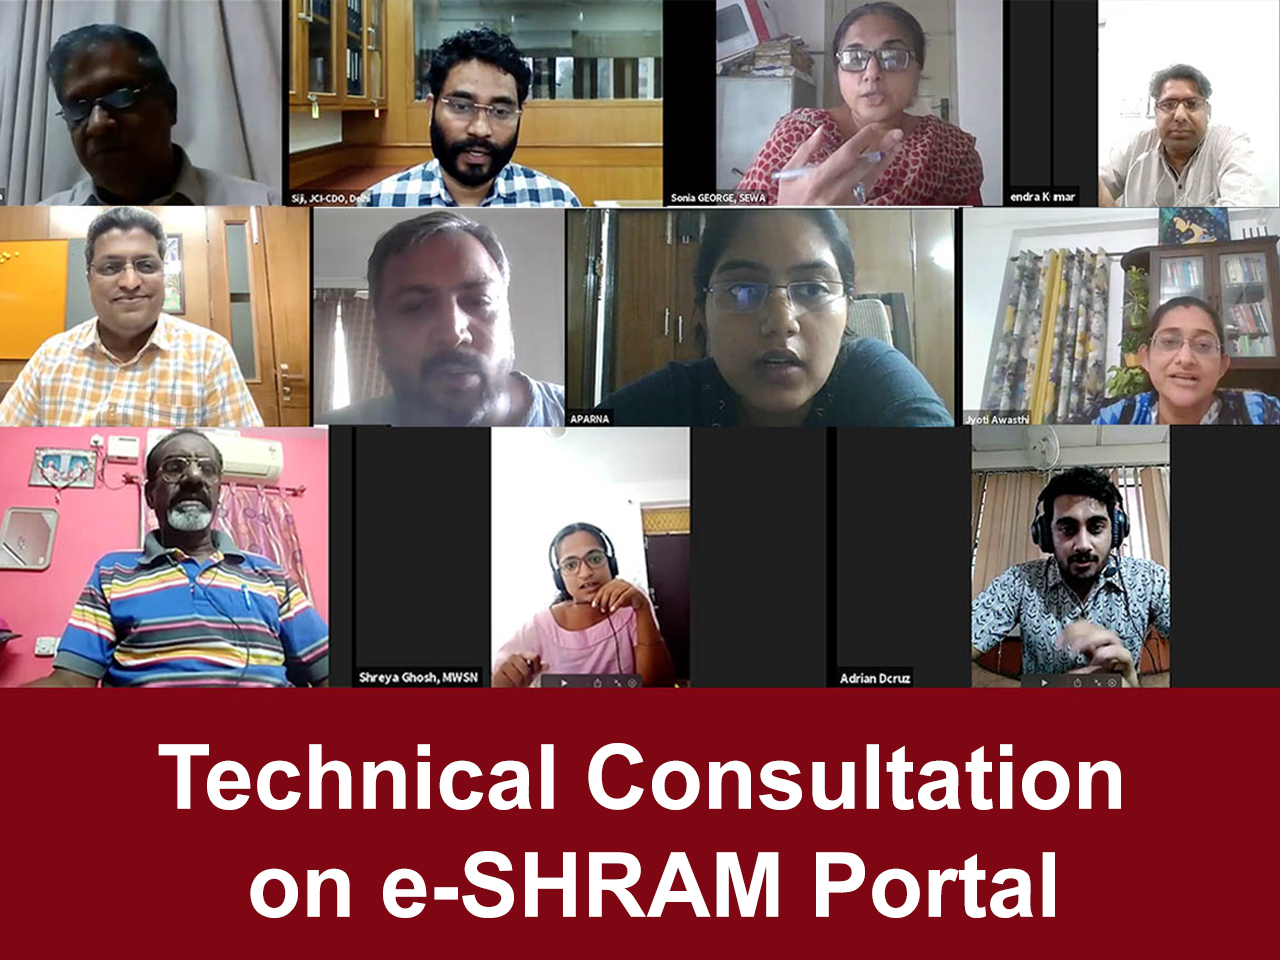 Technical Consultation on e-Shram Portal